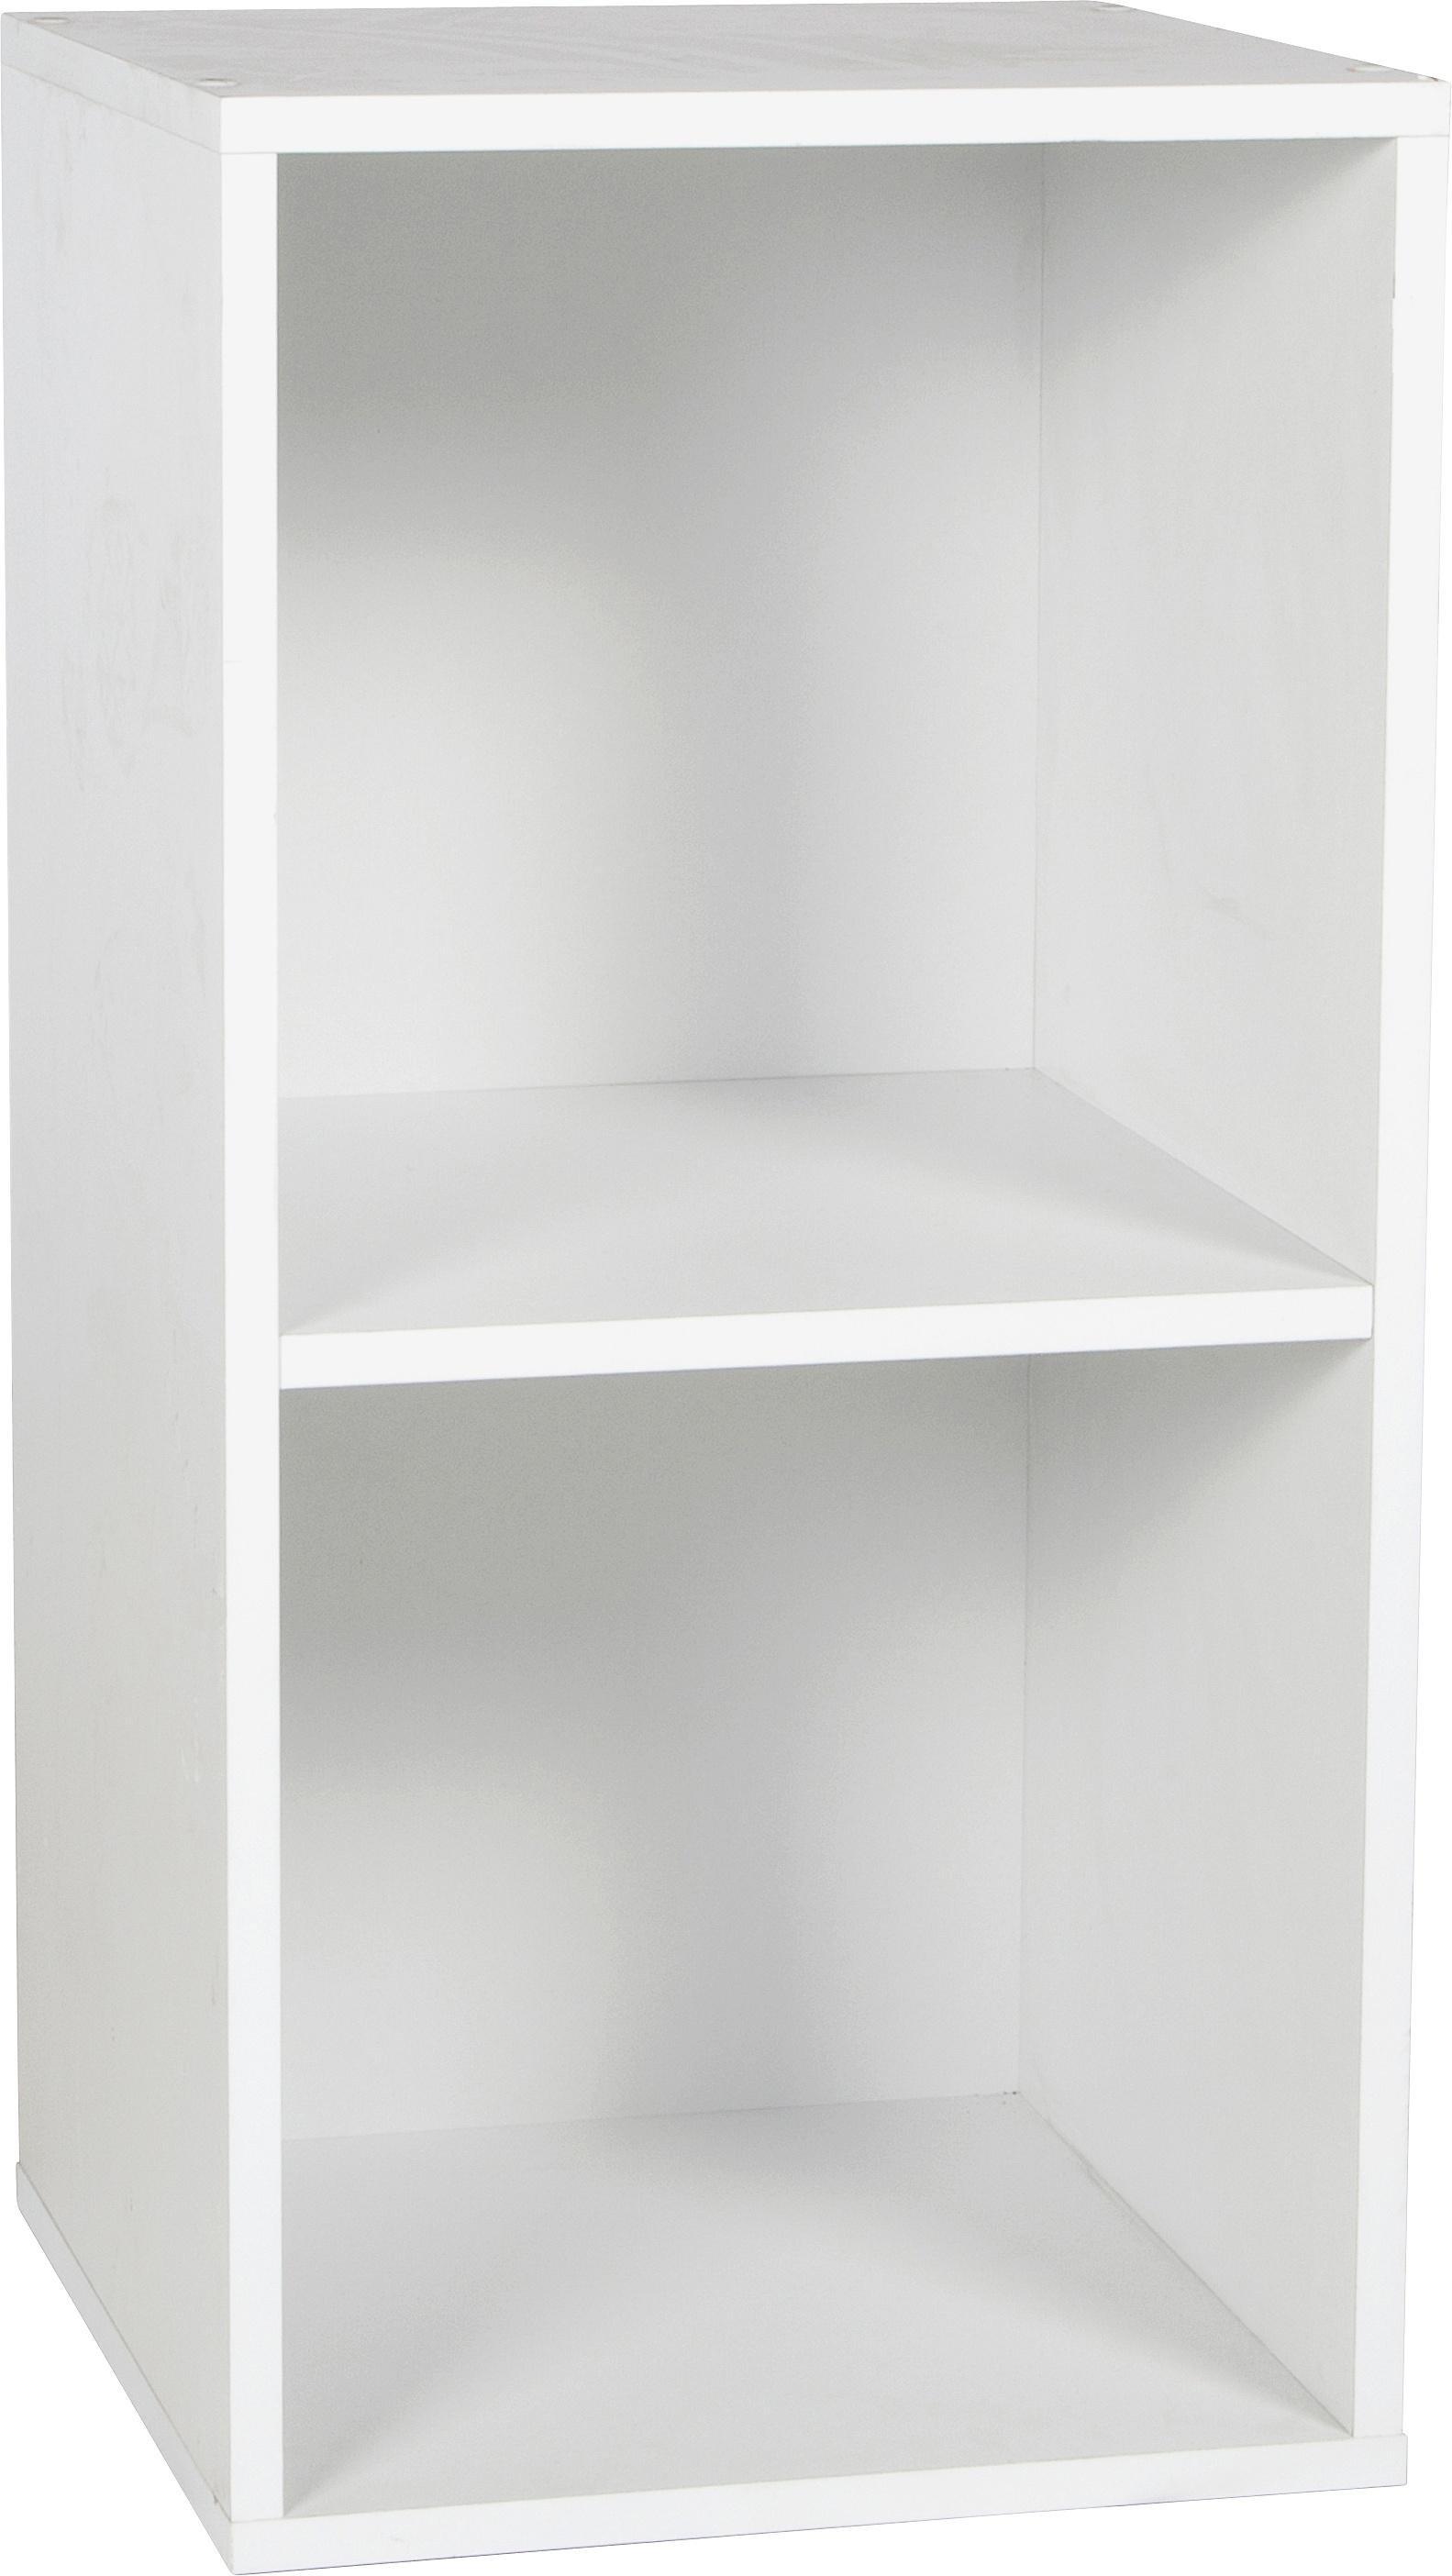 phoenix-2-cube-storage-unit-white